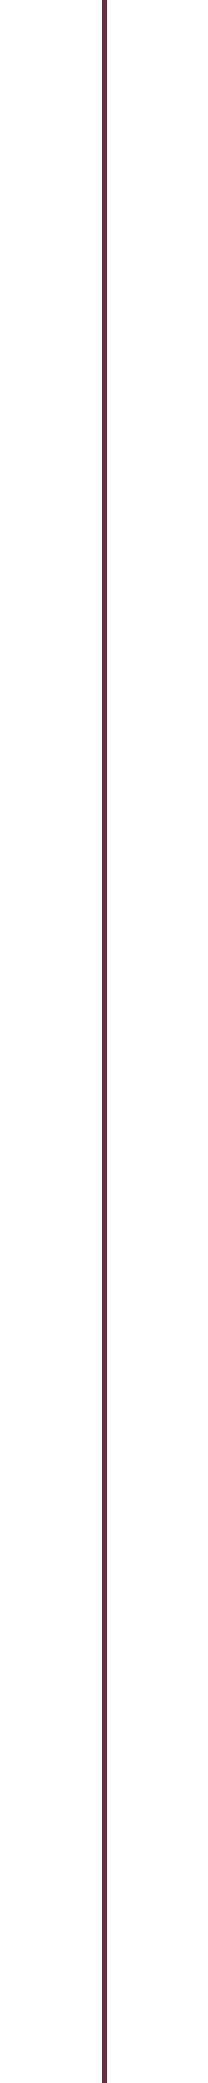 jbc-vertical-line.png